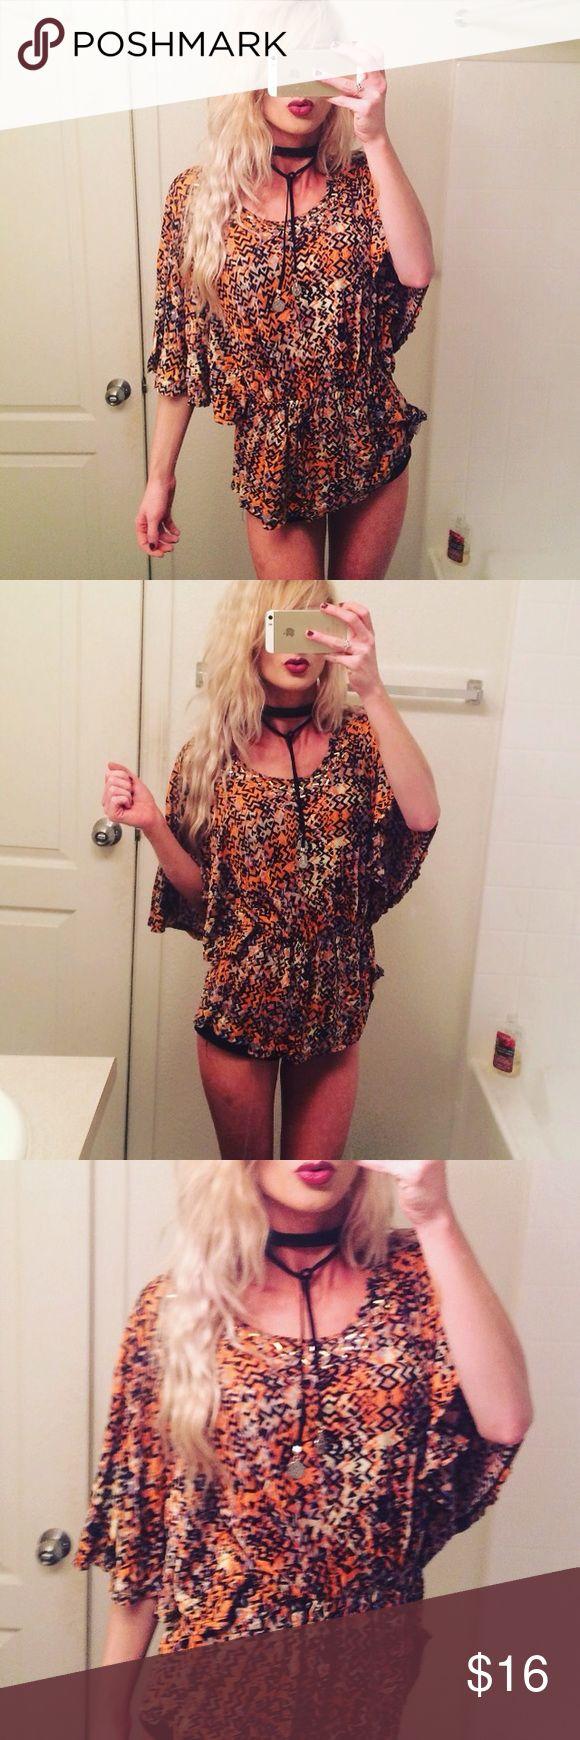 Aztec Tribal Top Size small. Aztec blouse. Brand Reba. NWOT. Never worn. Like Niger and looser fit. Reba Tops Blouses